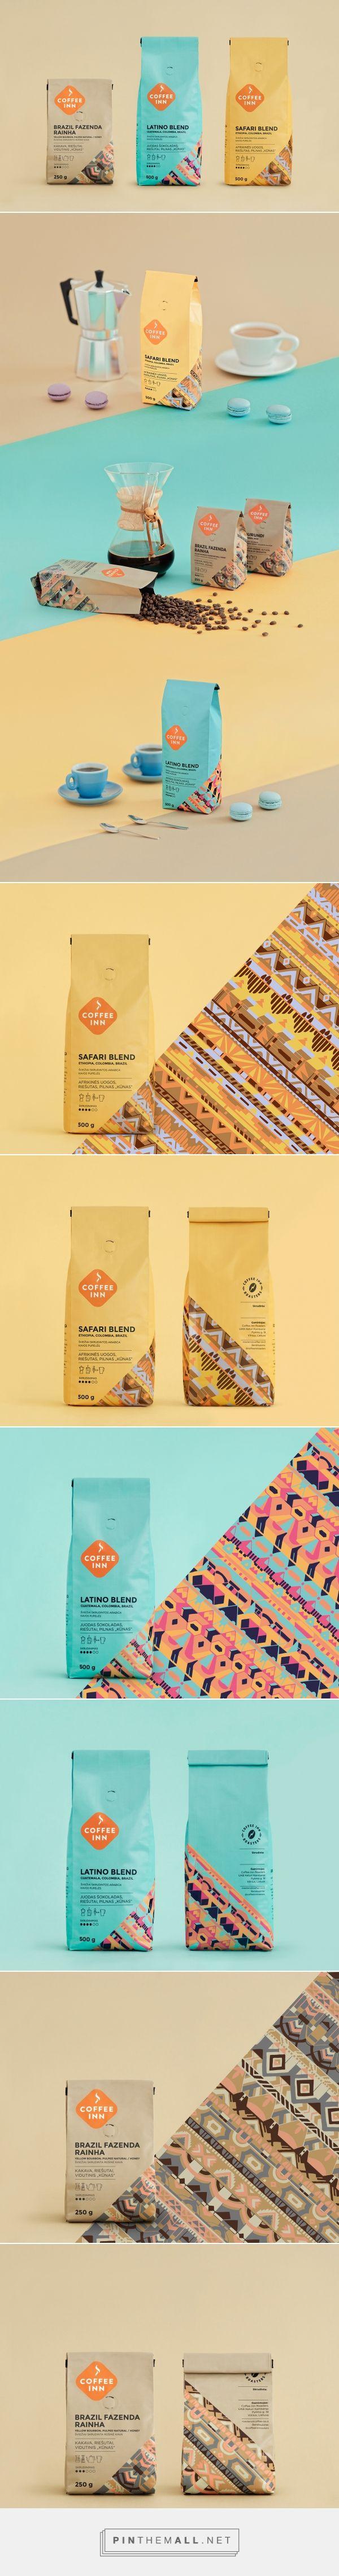 Coffee Inn Brand Packaging by Irmantas Savulionis on Behance | Fivestar Branding – Design and Branding Agency & Inspiration Gallery